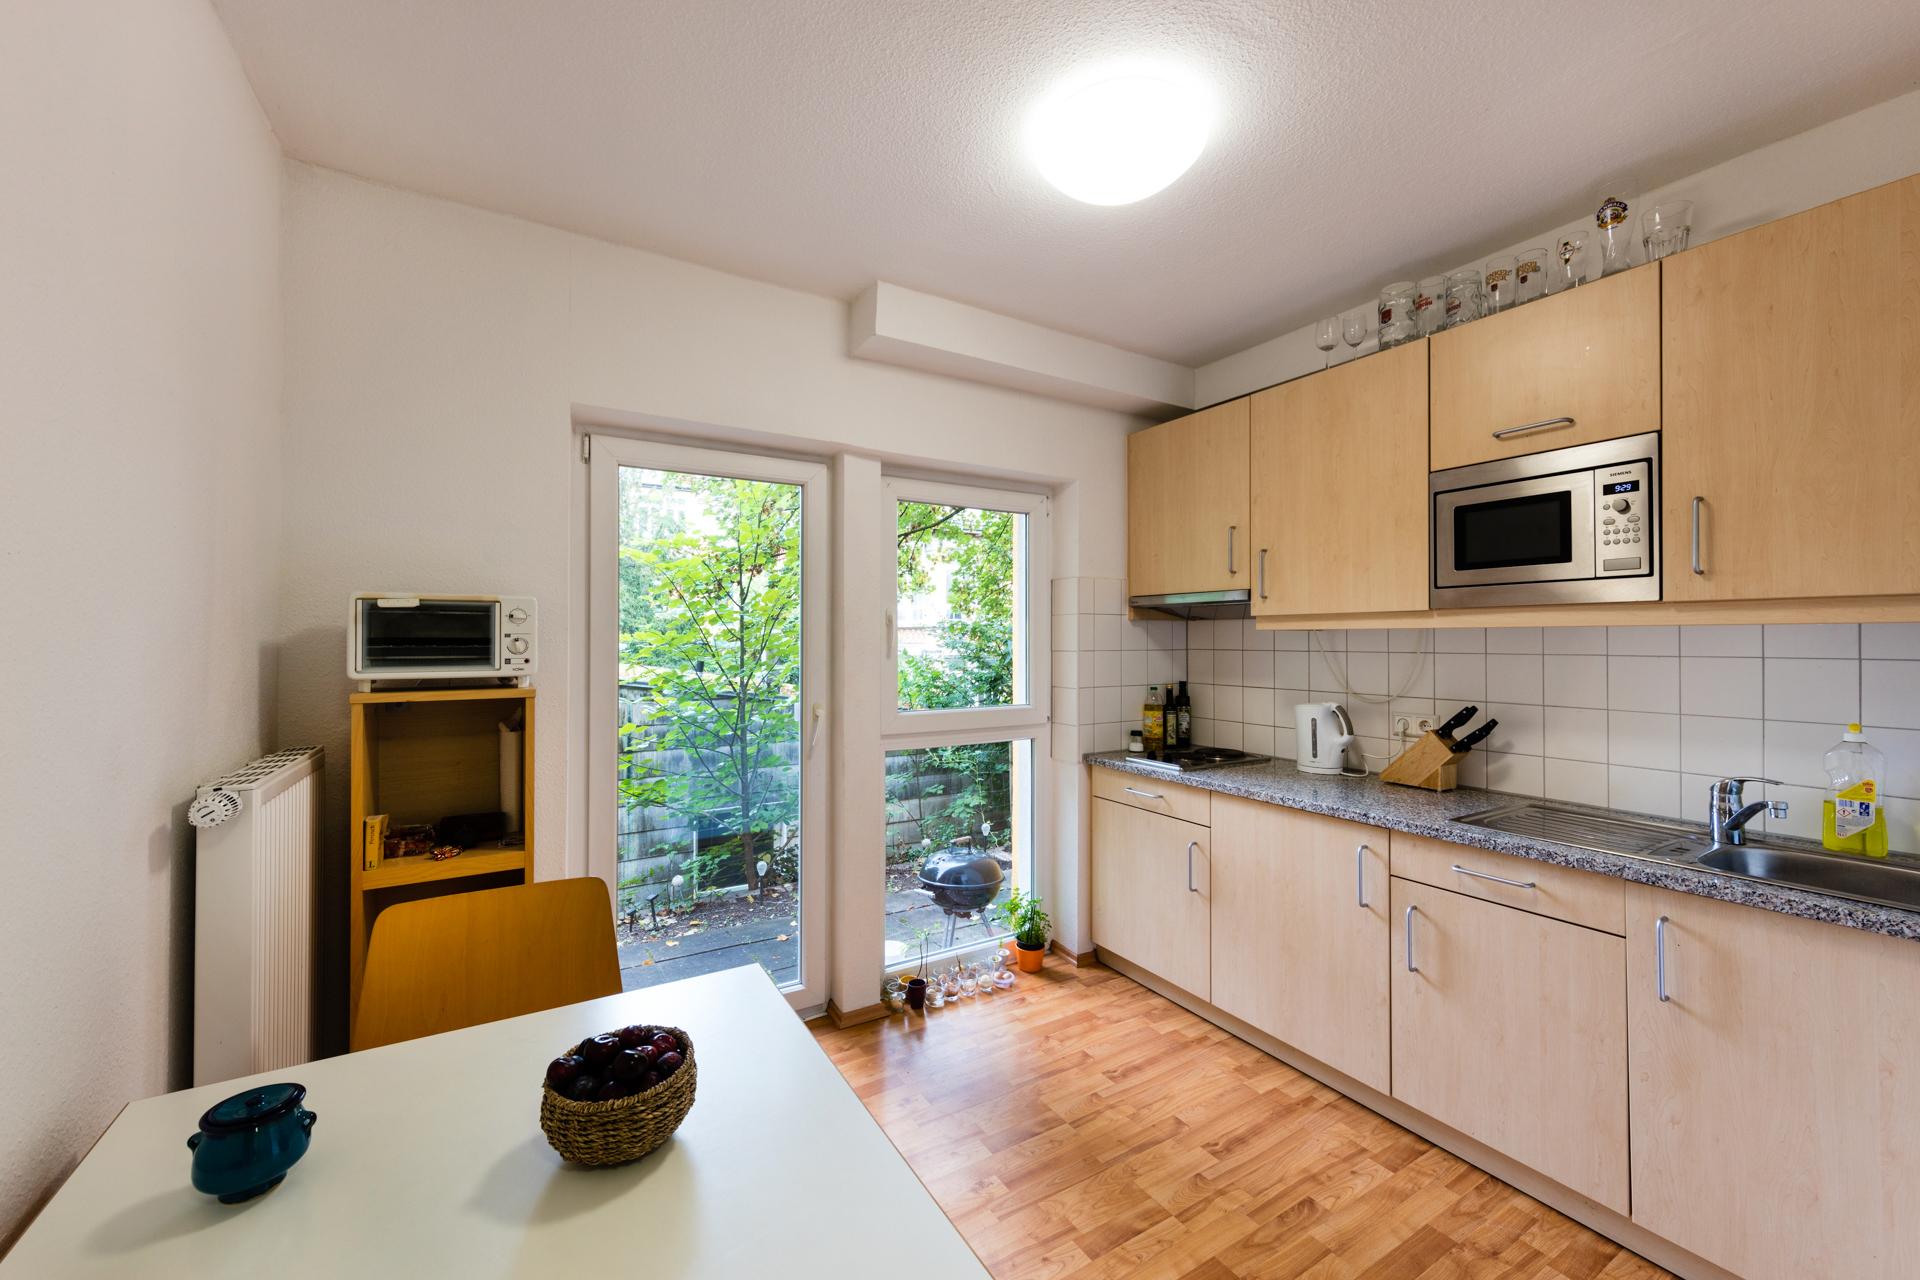 Einbaukche stuttgart elegant gas cooker germany europe for Single kuchenblock